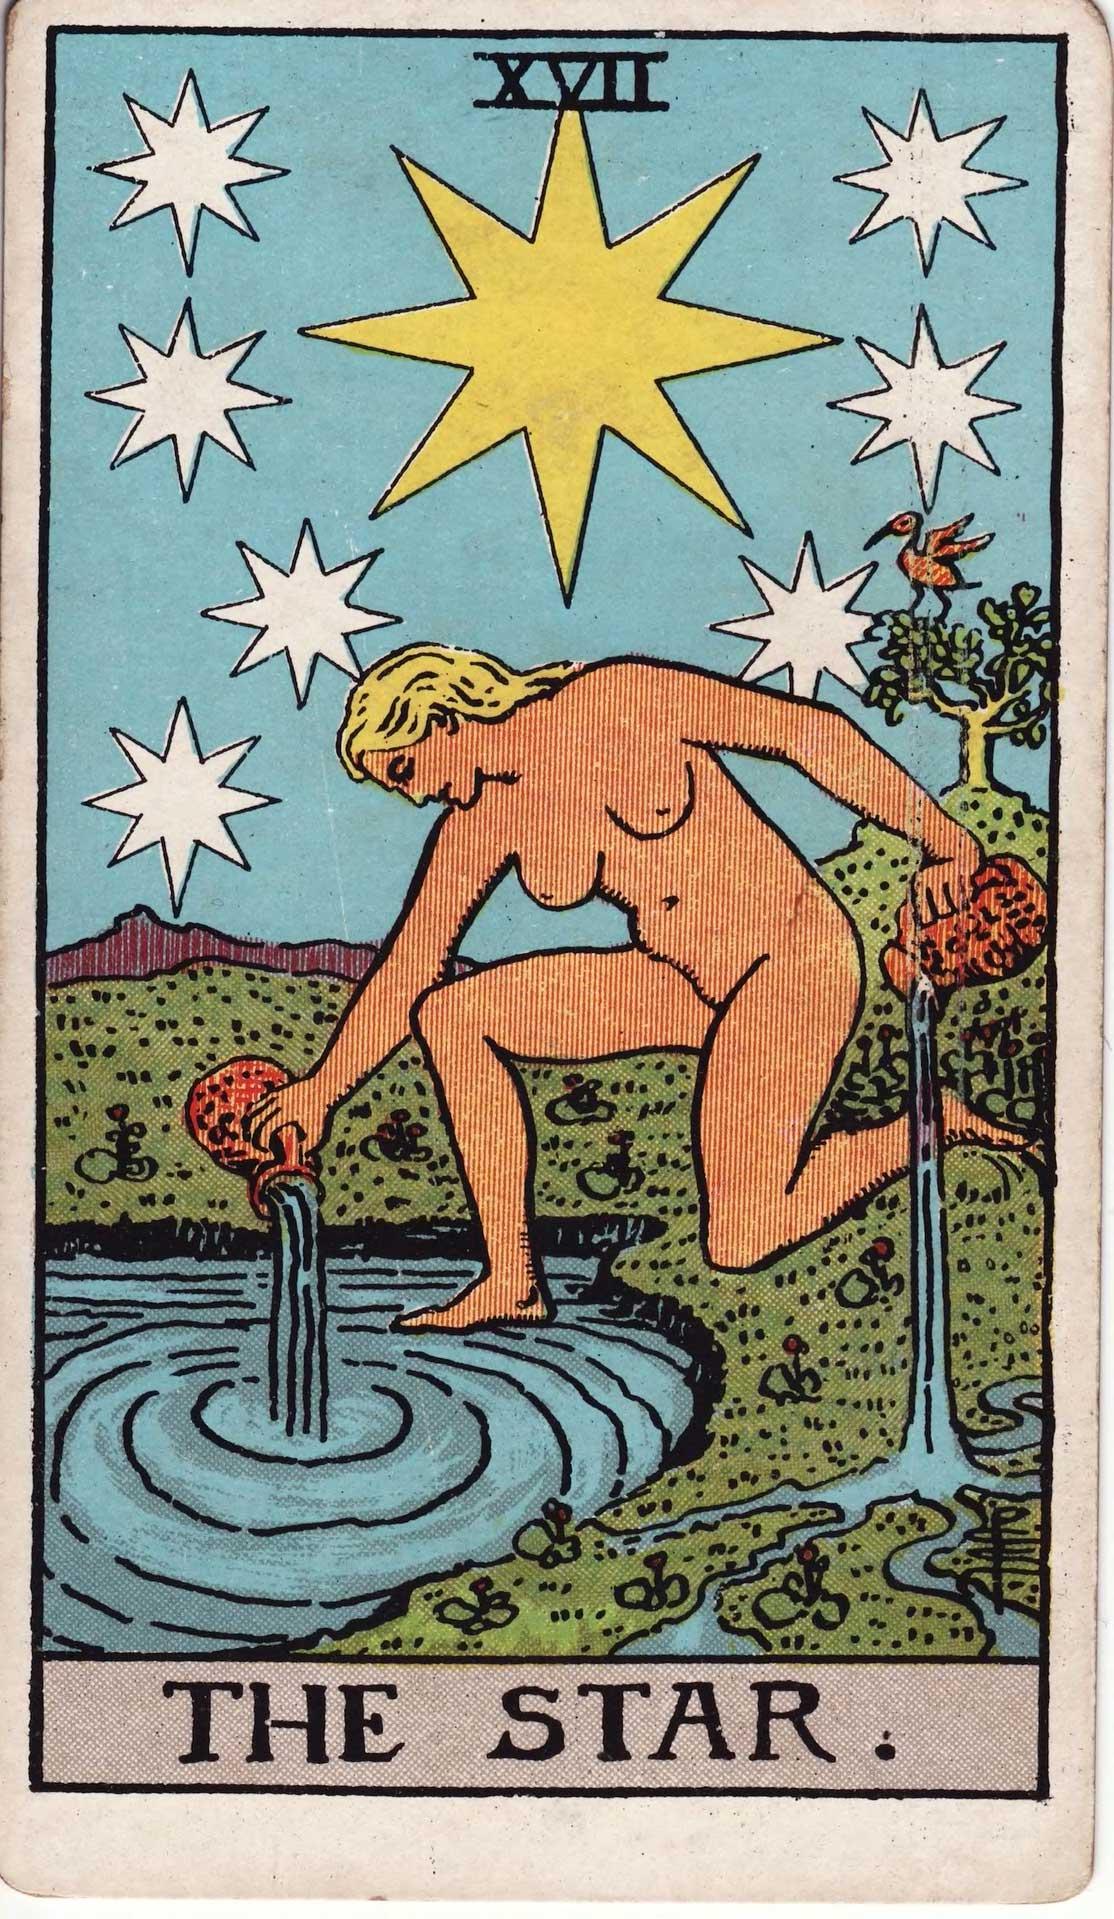 La Estrella Tarot Arcano Número 17